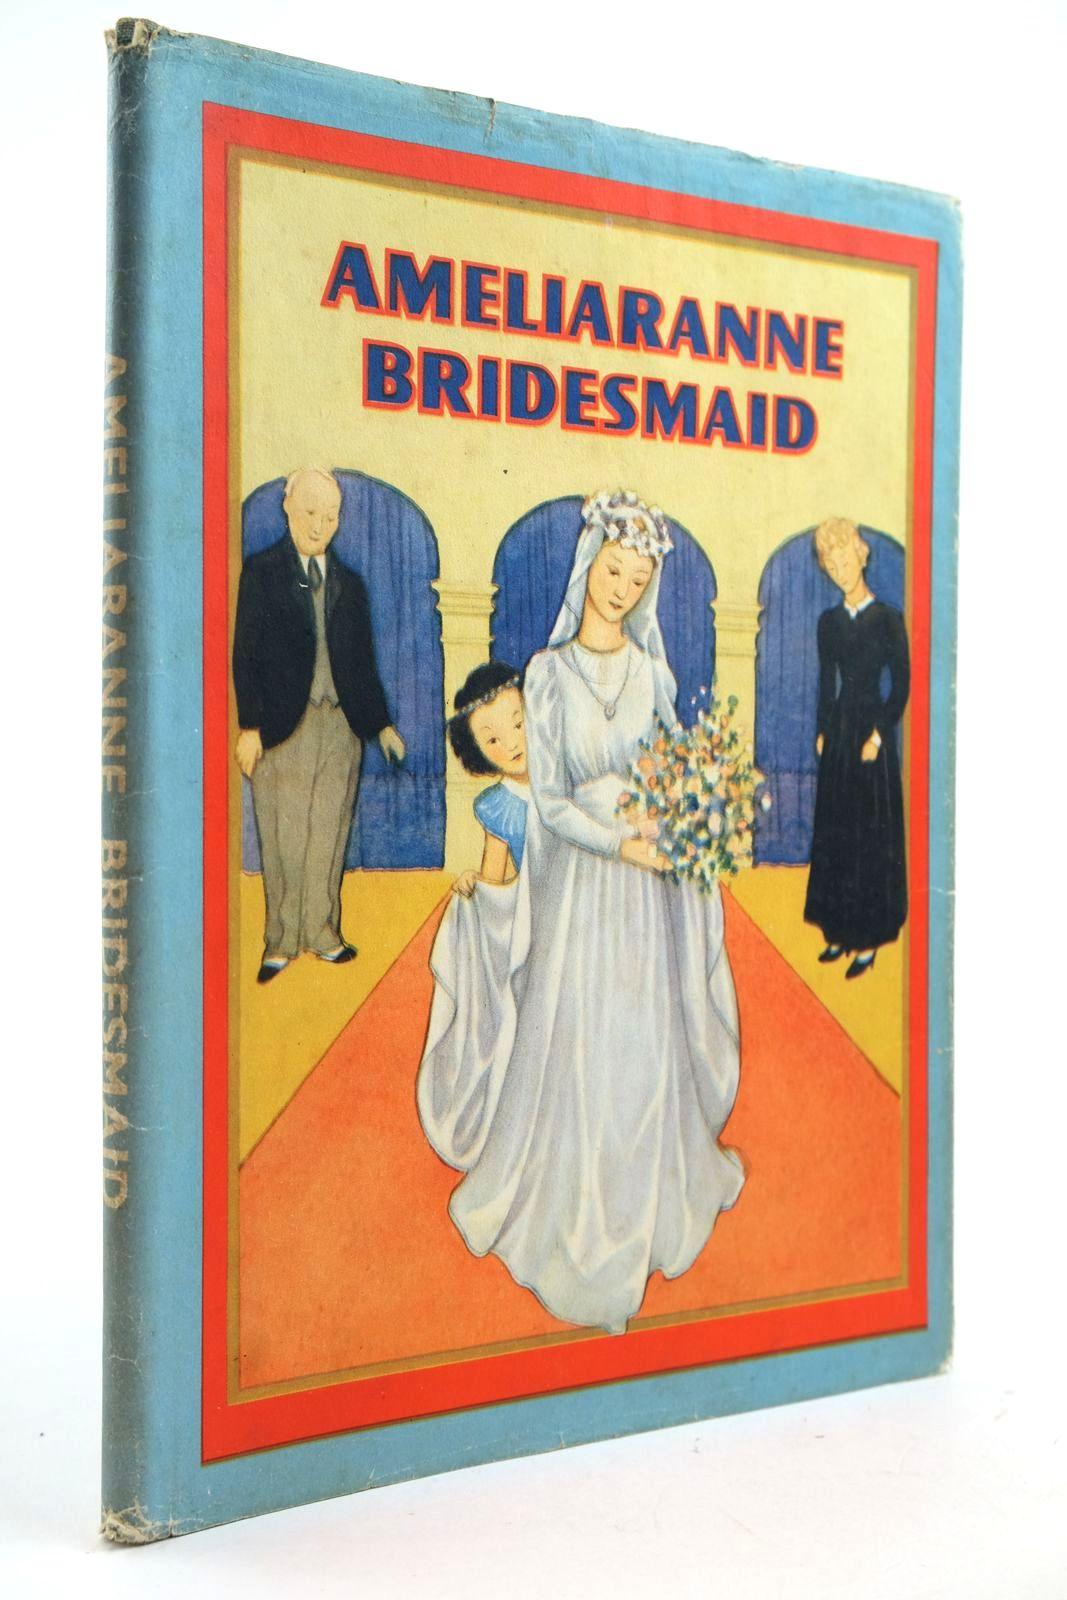 Photo of AMELIARANNE BRIDESMAID- Stock Number: 2132993